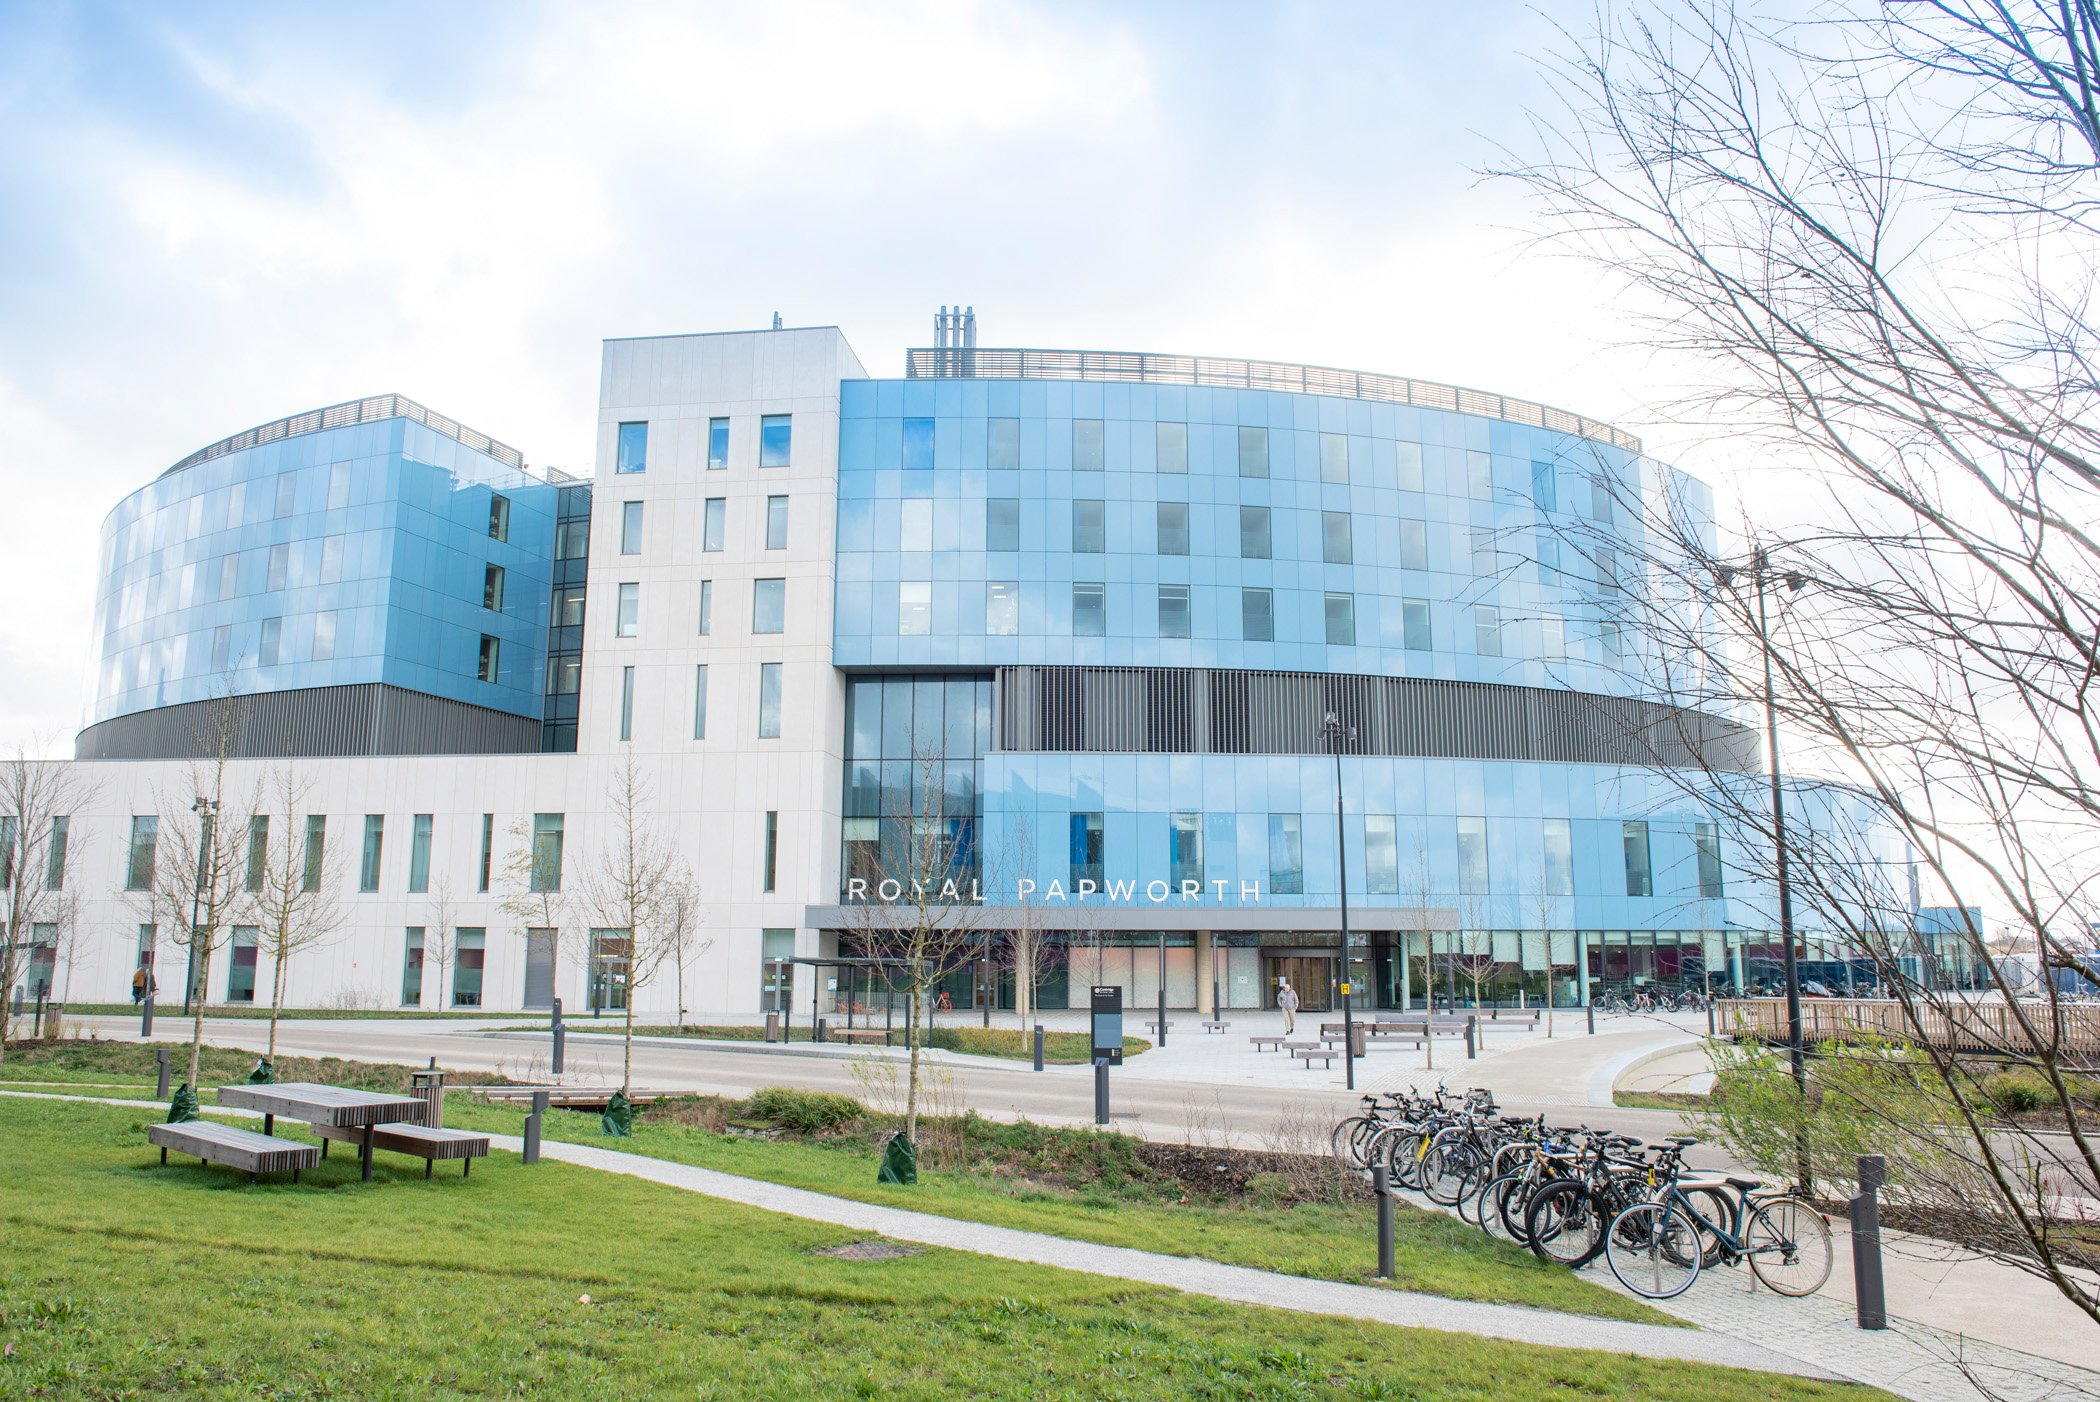 Royal_Papworth_Hospital_-_external_-_north_entrance